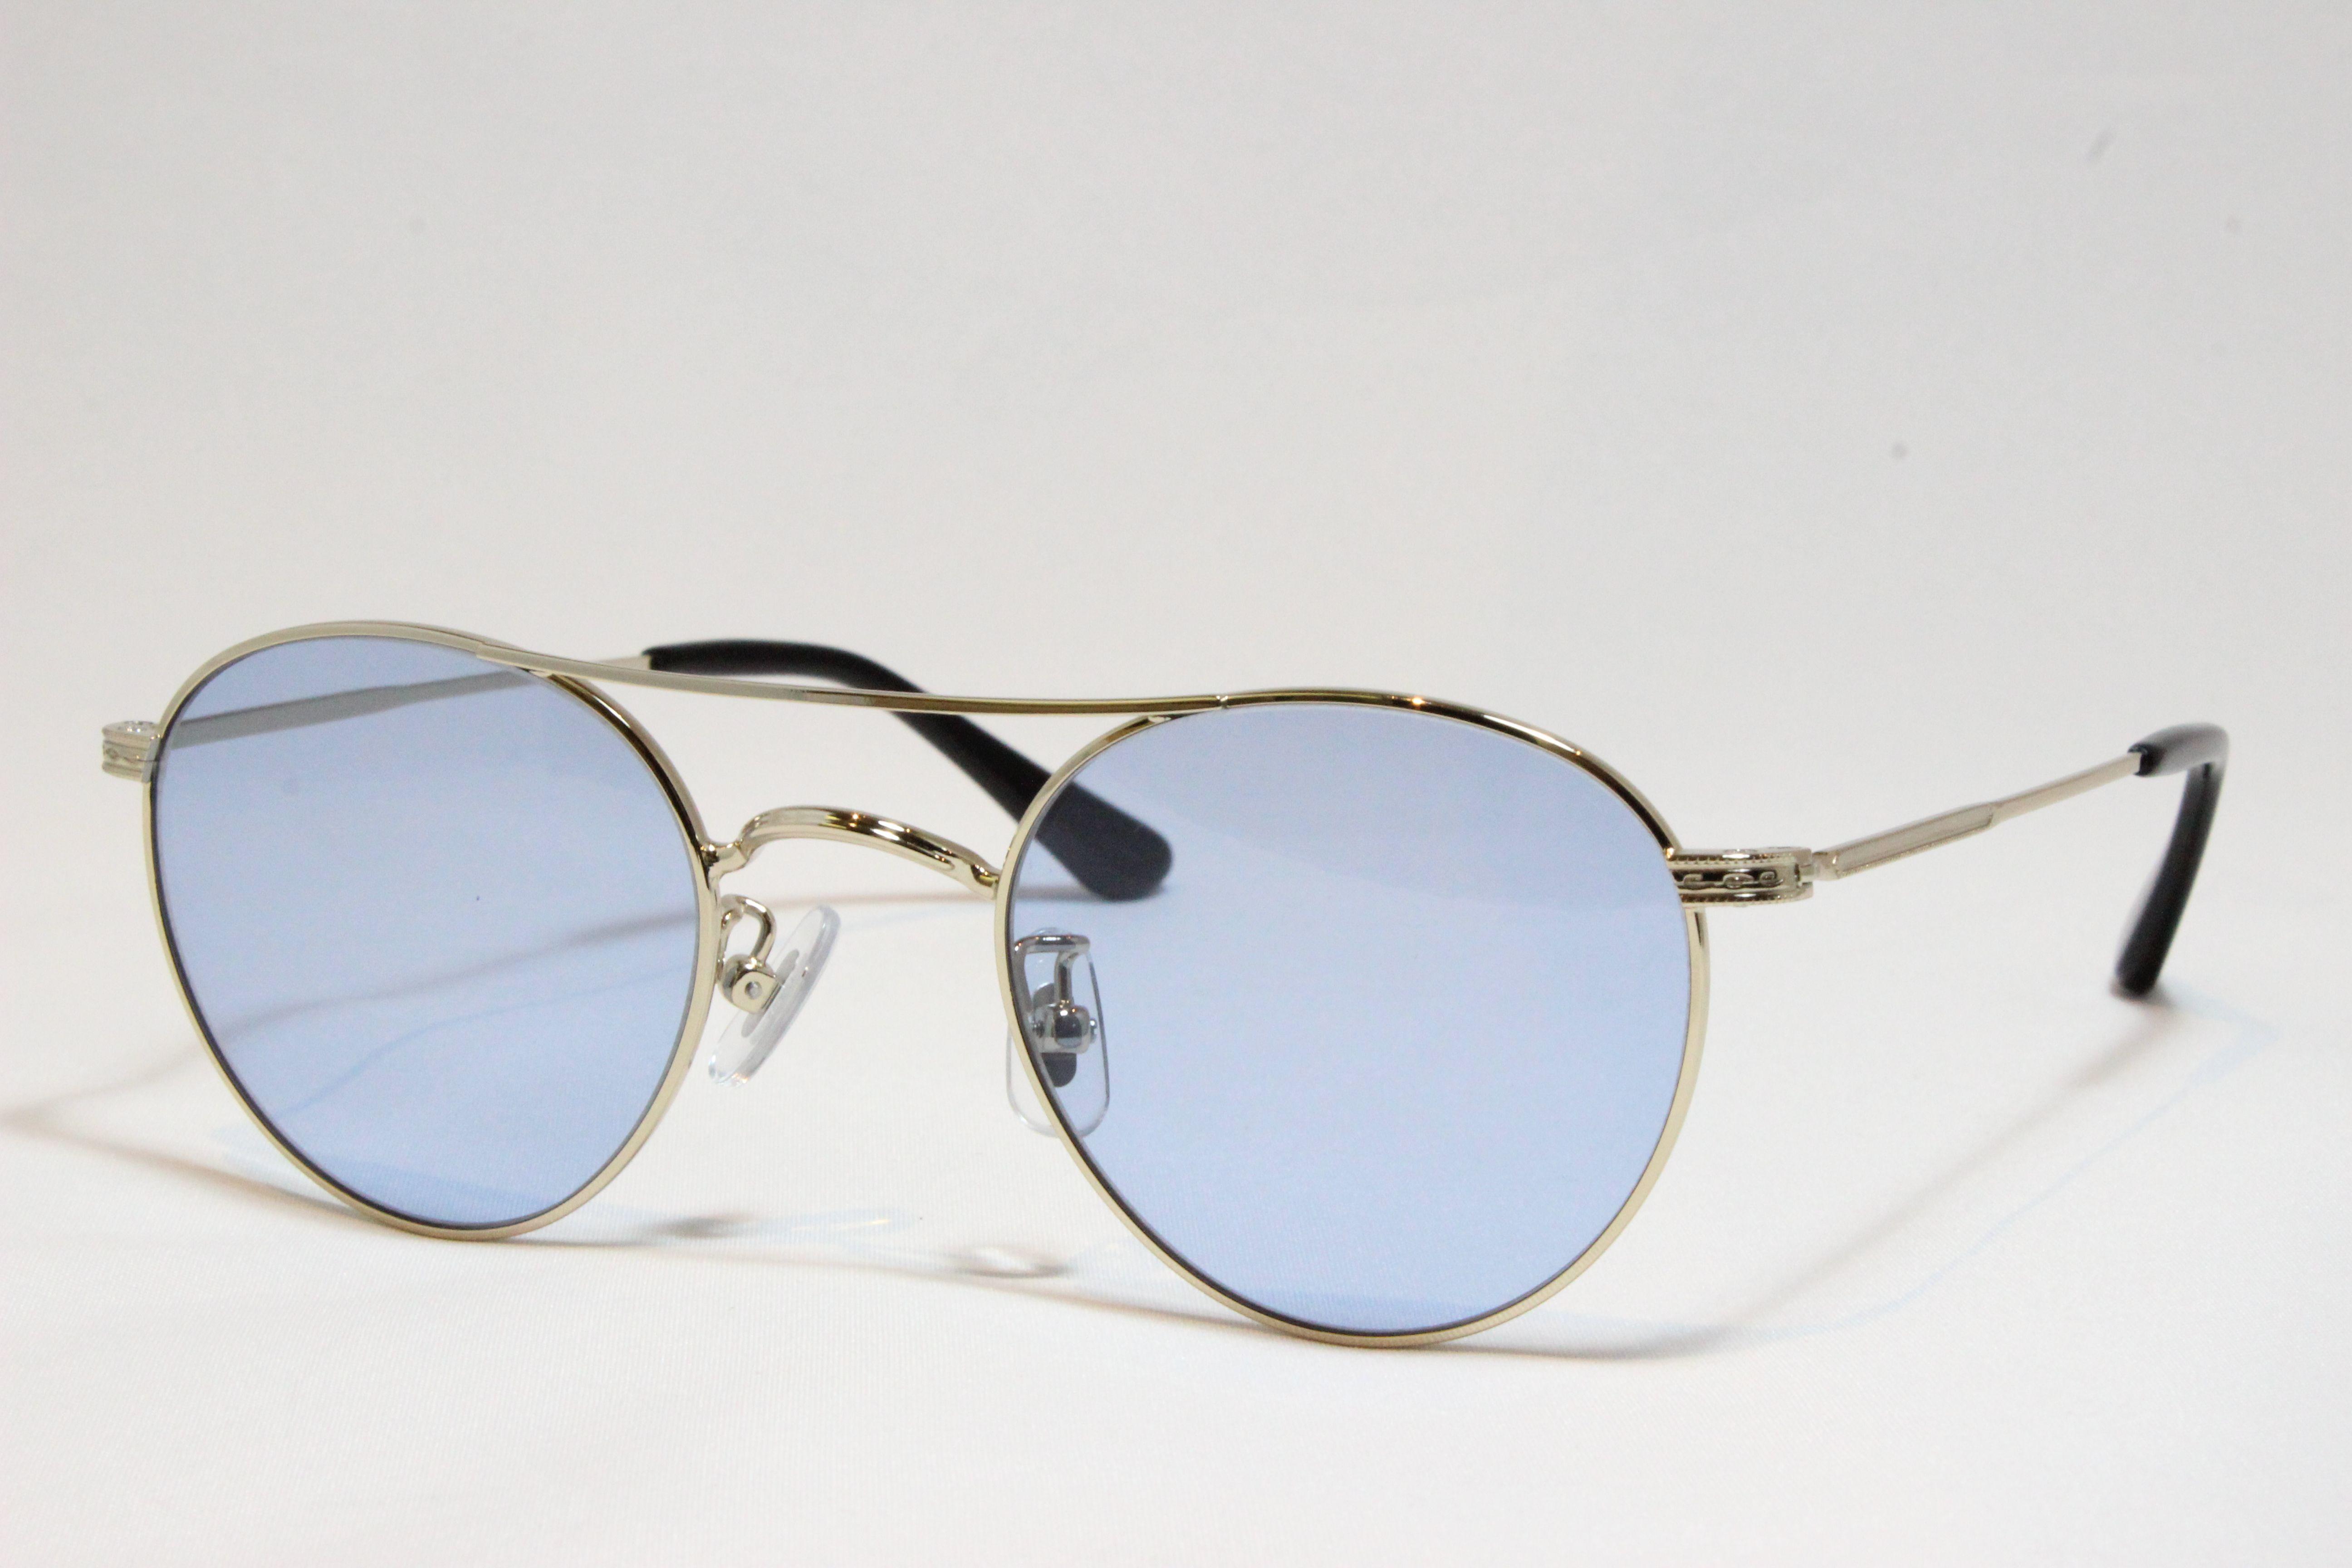 【送料無料】Reminence EYEWEAR  IV-125 ( Silver / Light Blue )